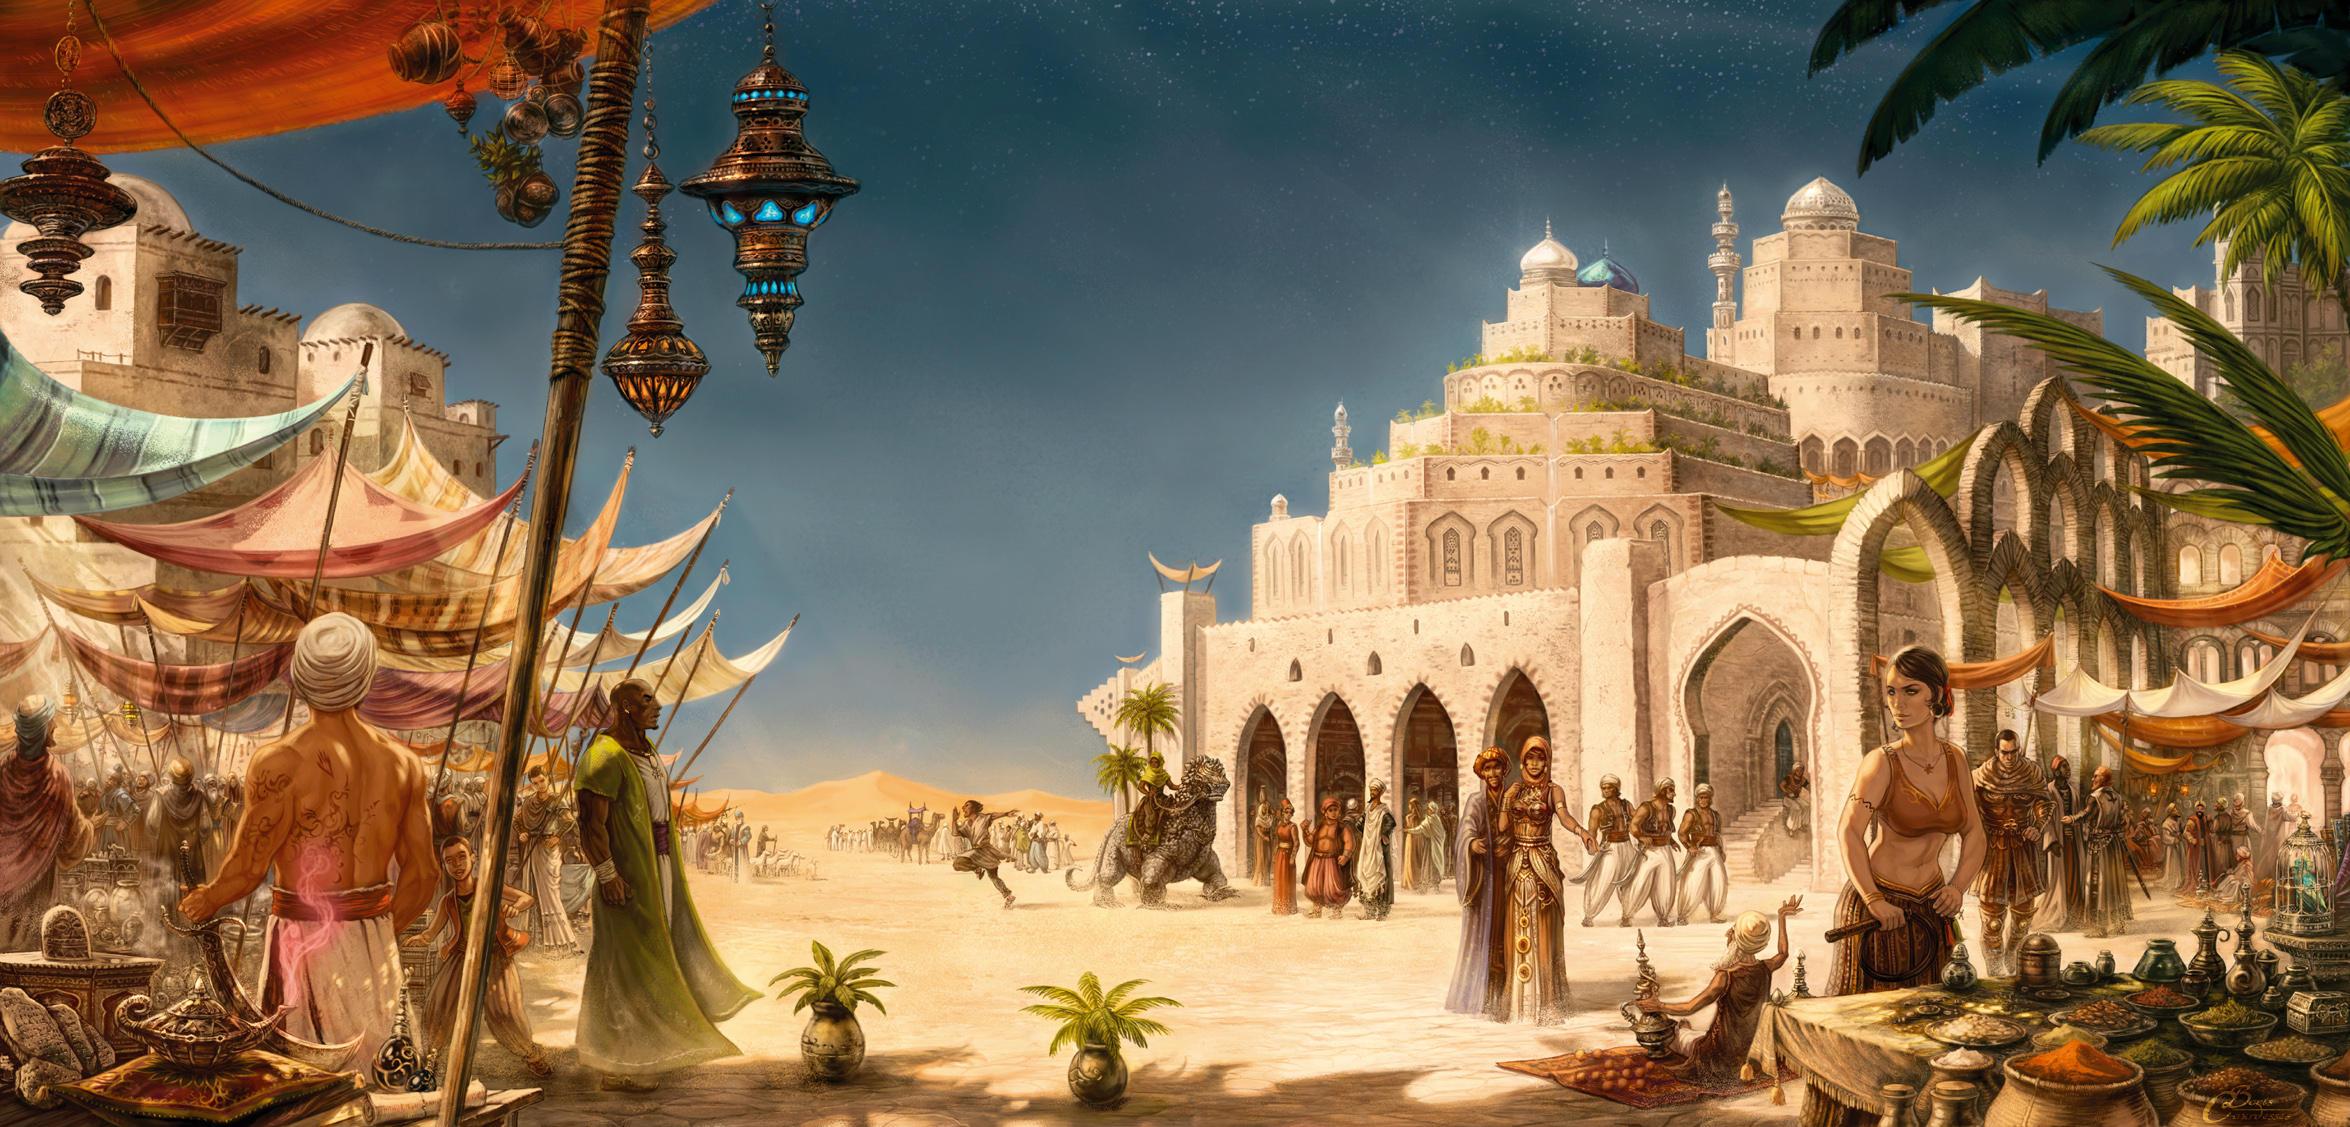 CAPHARNAUM - Yasminabad by Agalanthe